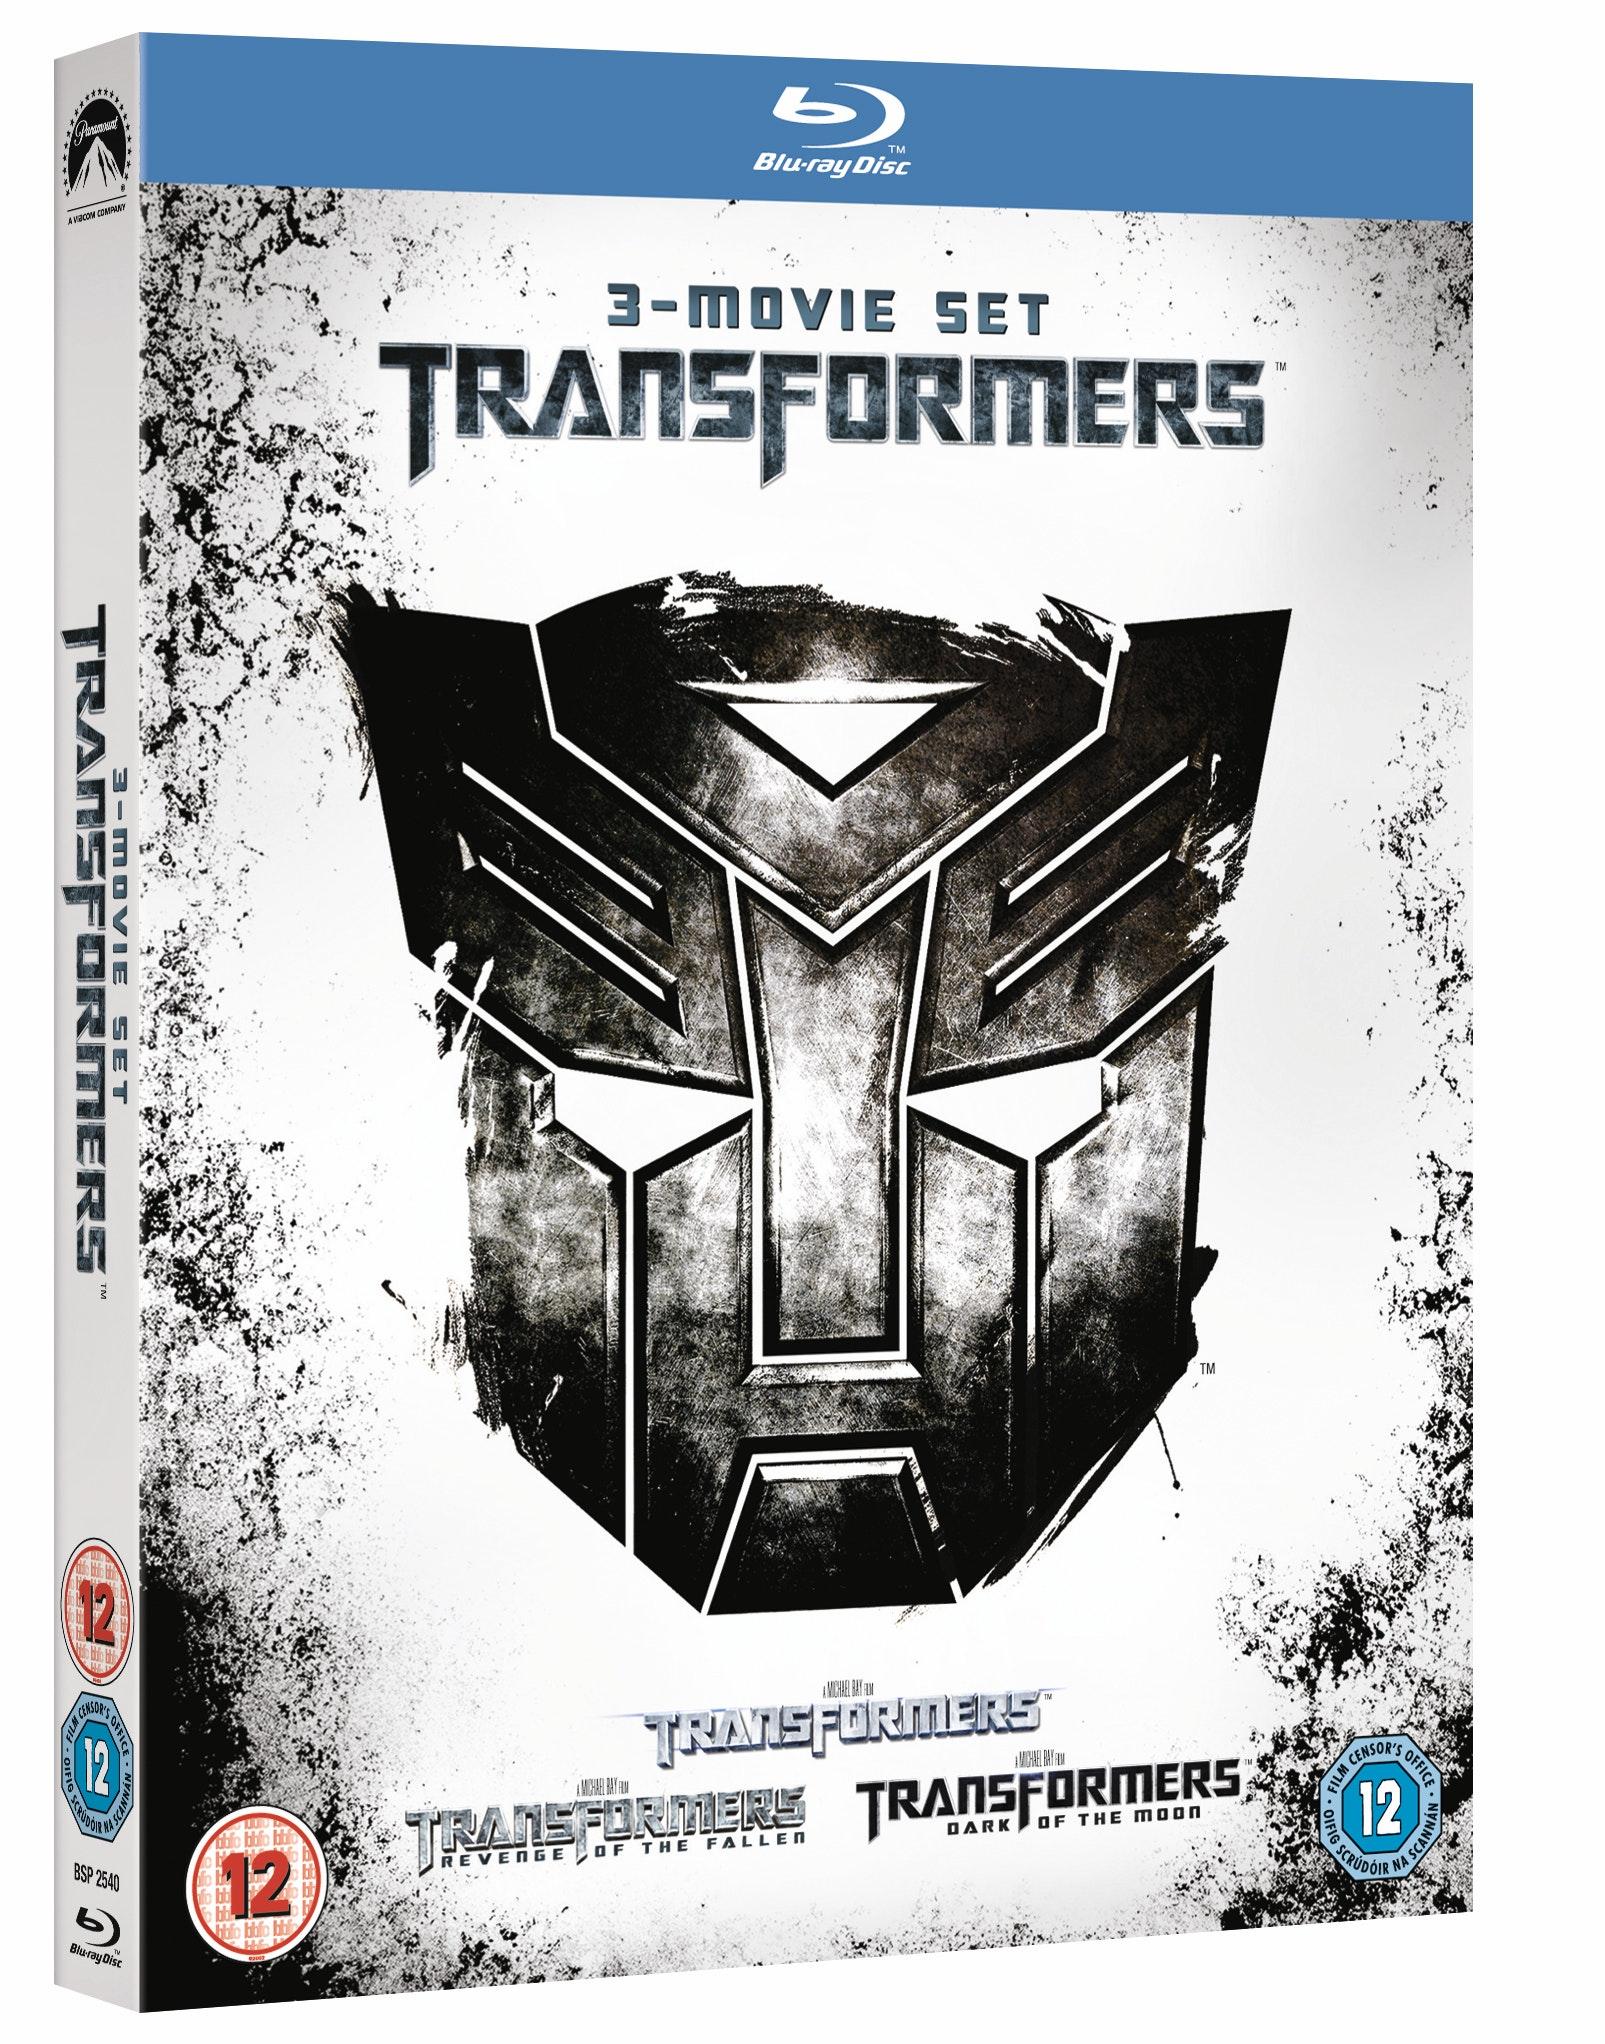 Transformers1 3 bdoring 3disc retail 3d